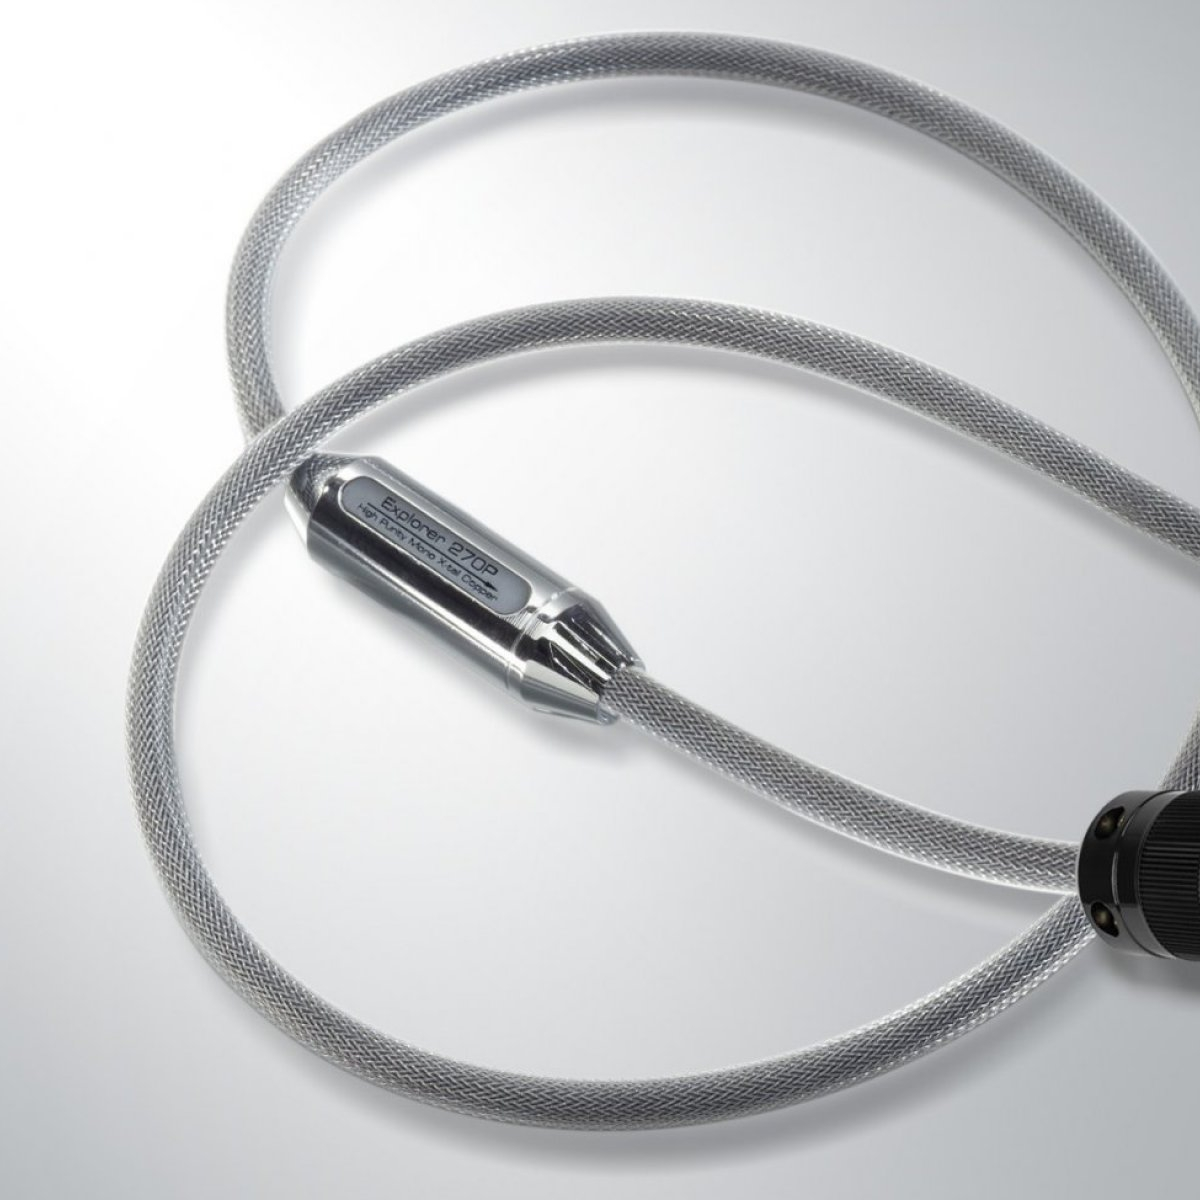 Siltech Explorer 270P Power cable for Audio